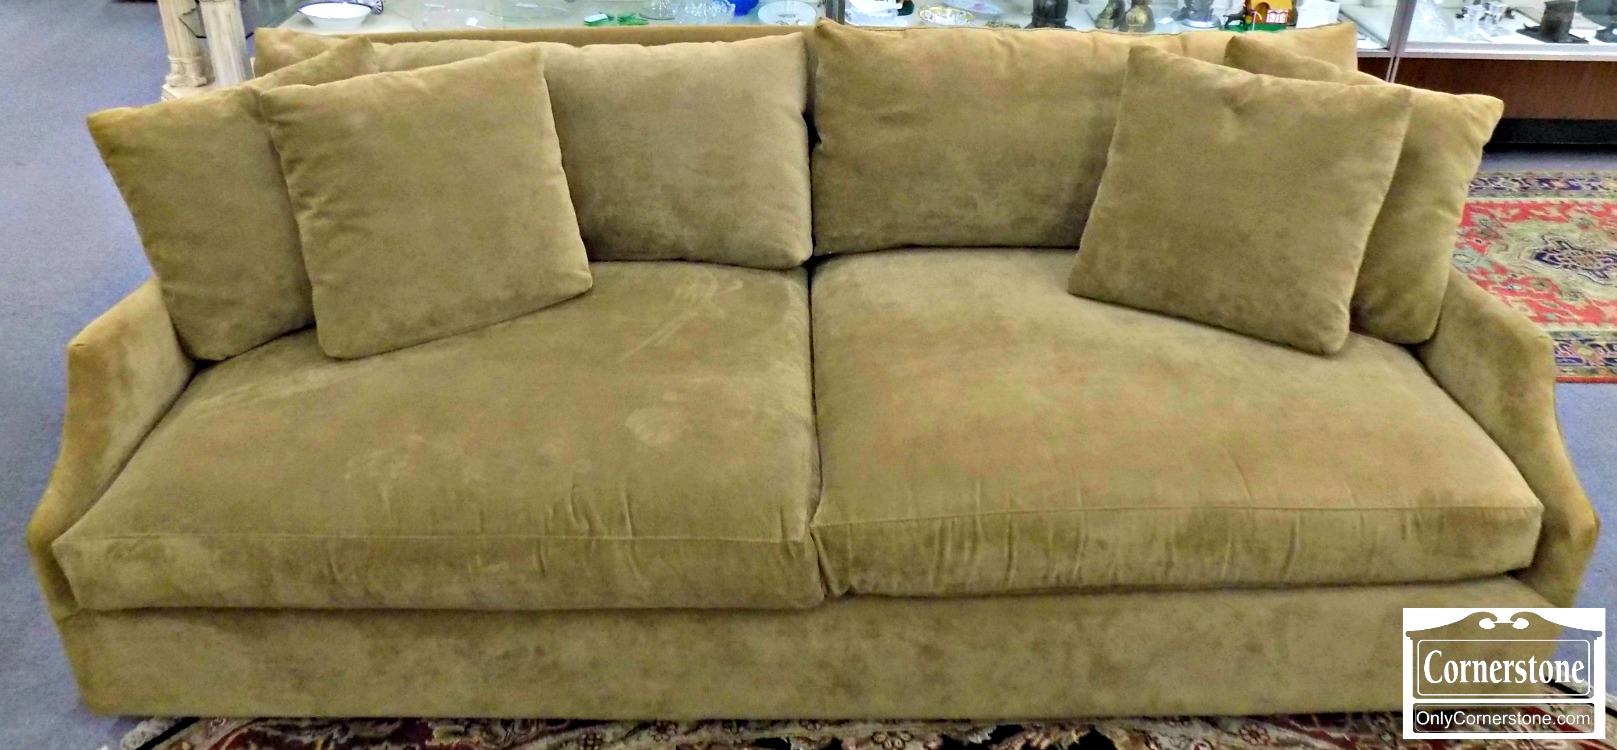 Arhaus Large Contemporary Olive Upholstered Sofa | Baltimore, Maryland  Furniture Store U2013 Cornerstone